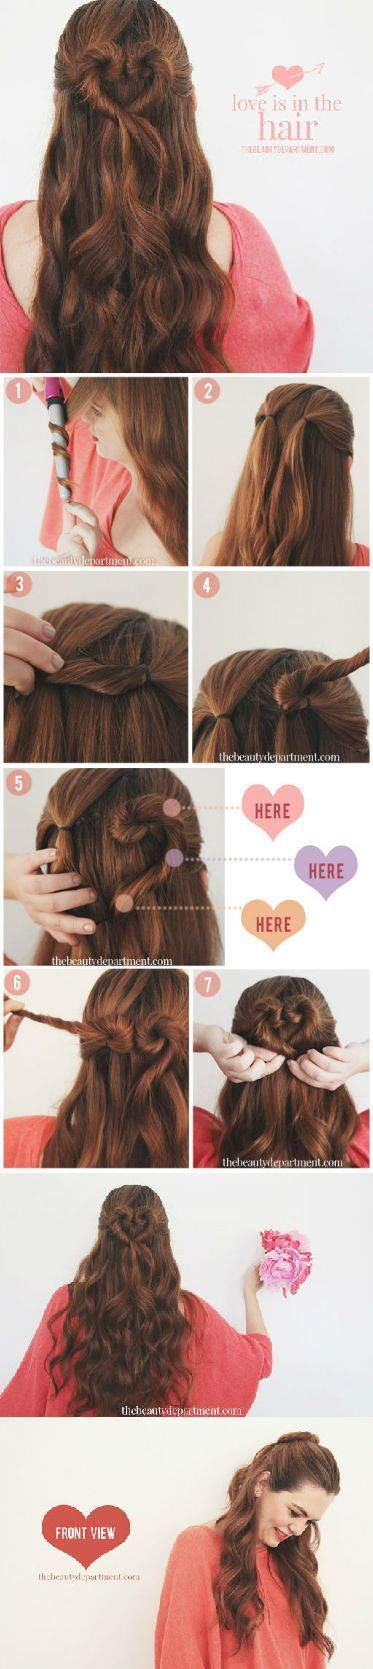 DIY Heart Bun diy long hair updo diy hair diy bun hairstyles hair tutorials easy…